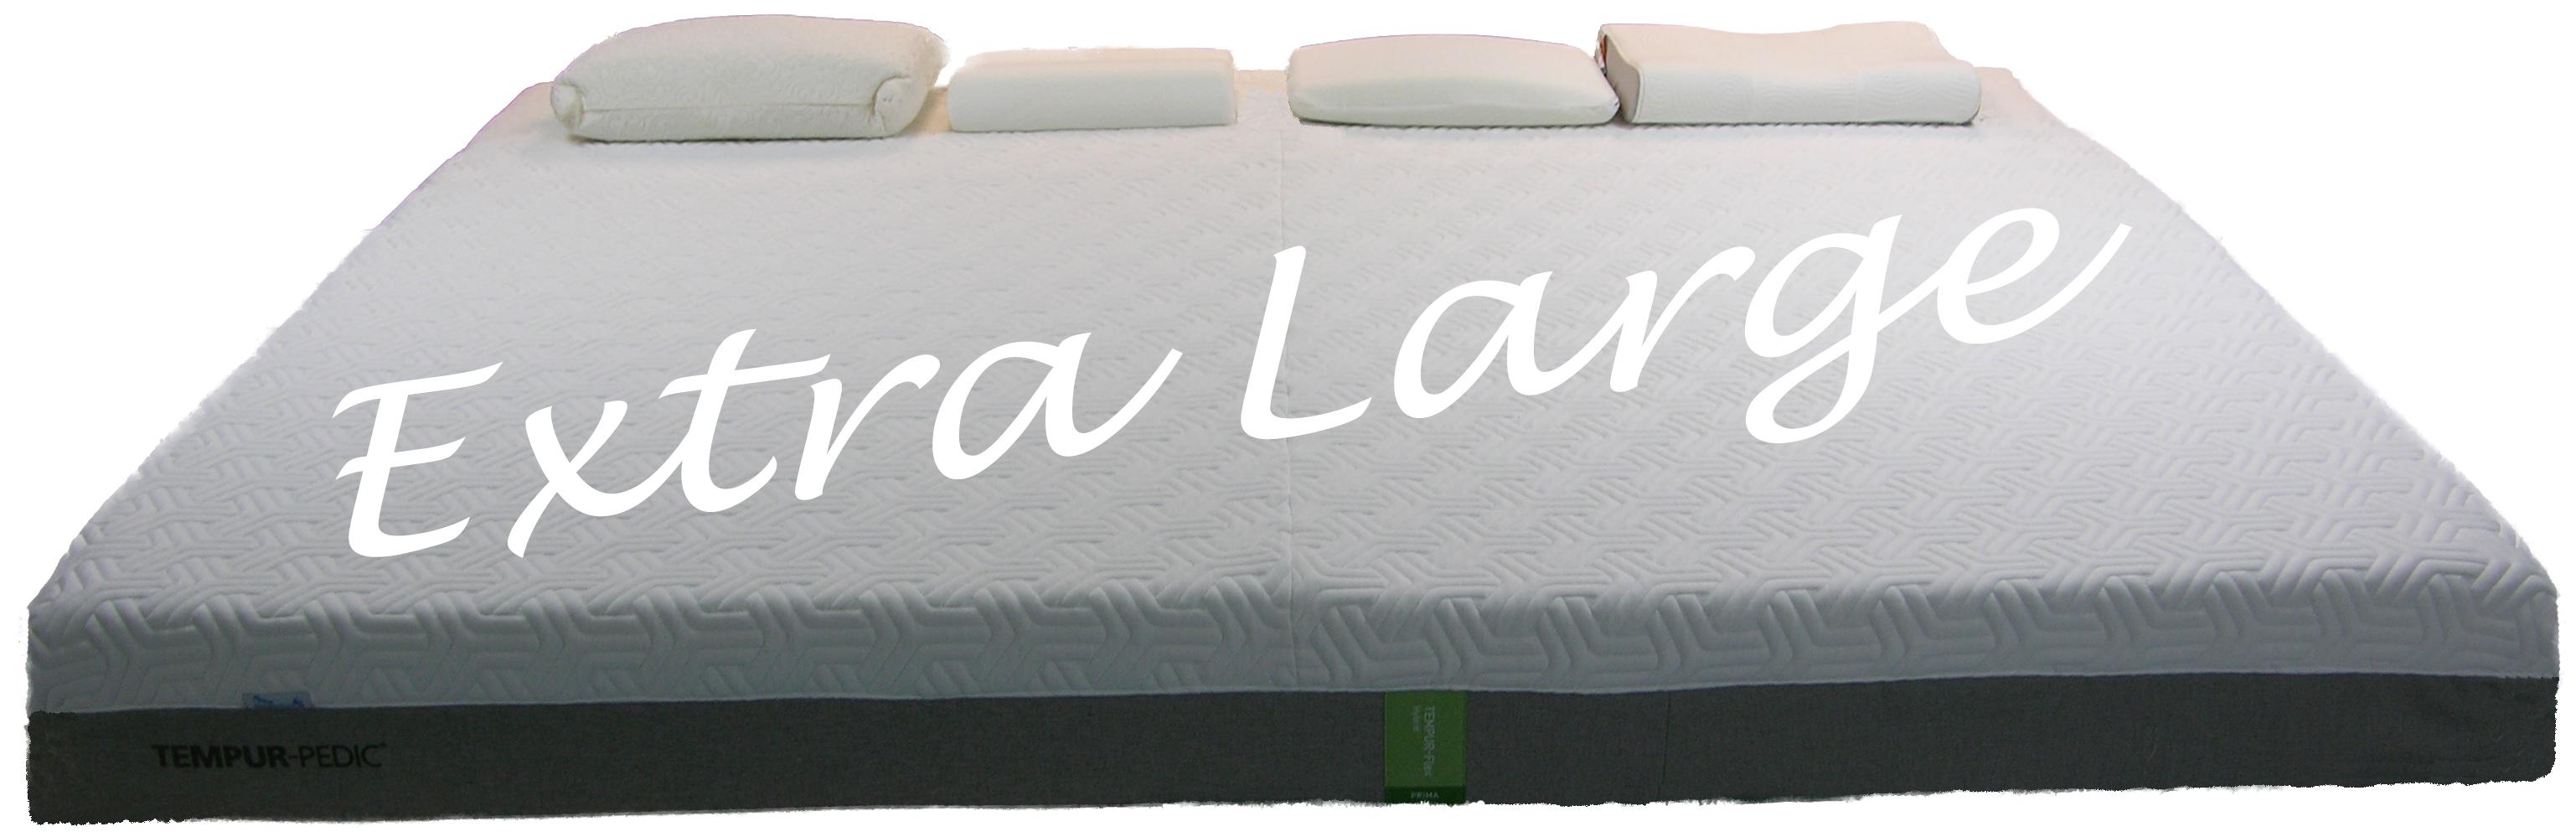 Extra Large Mattress custom made from Tempur-Pedic mattresses